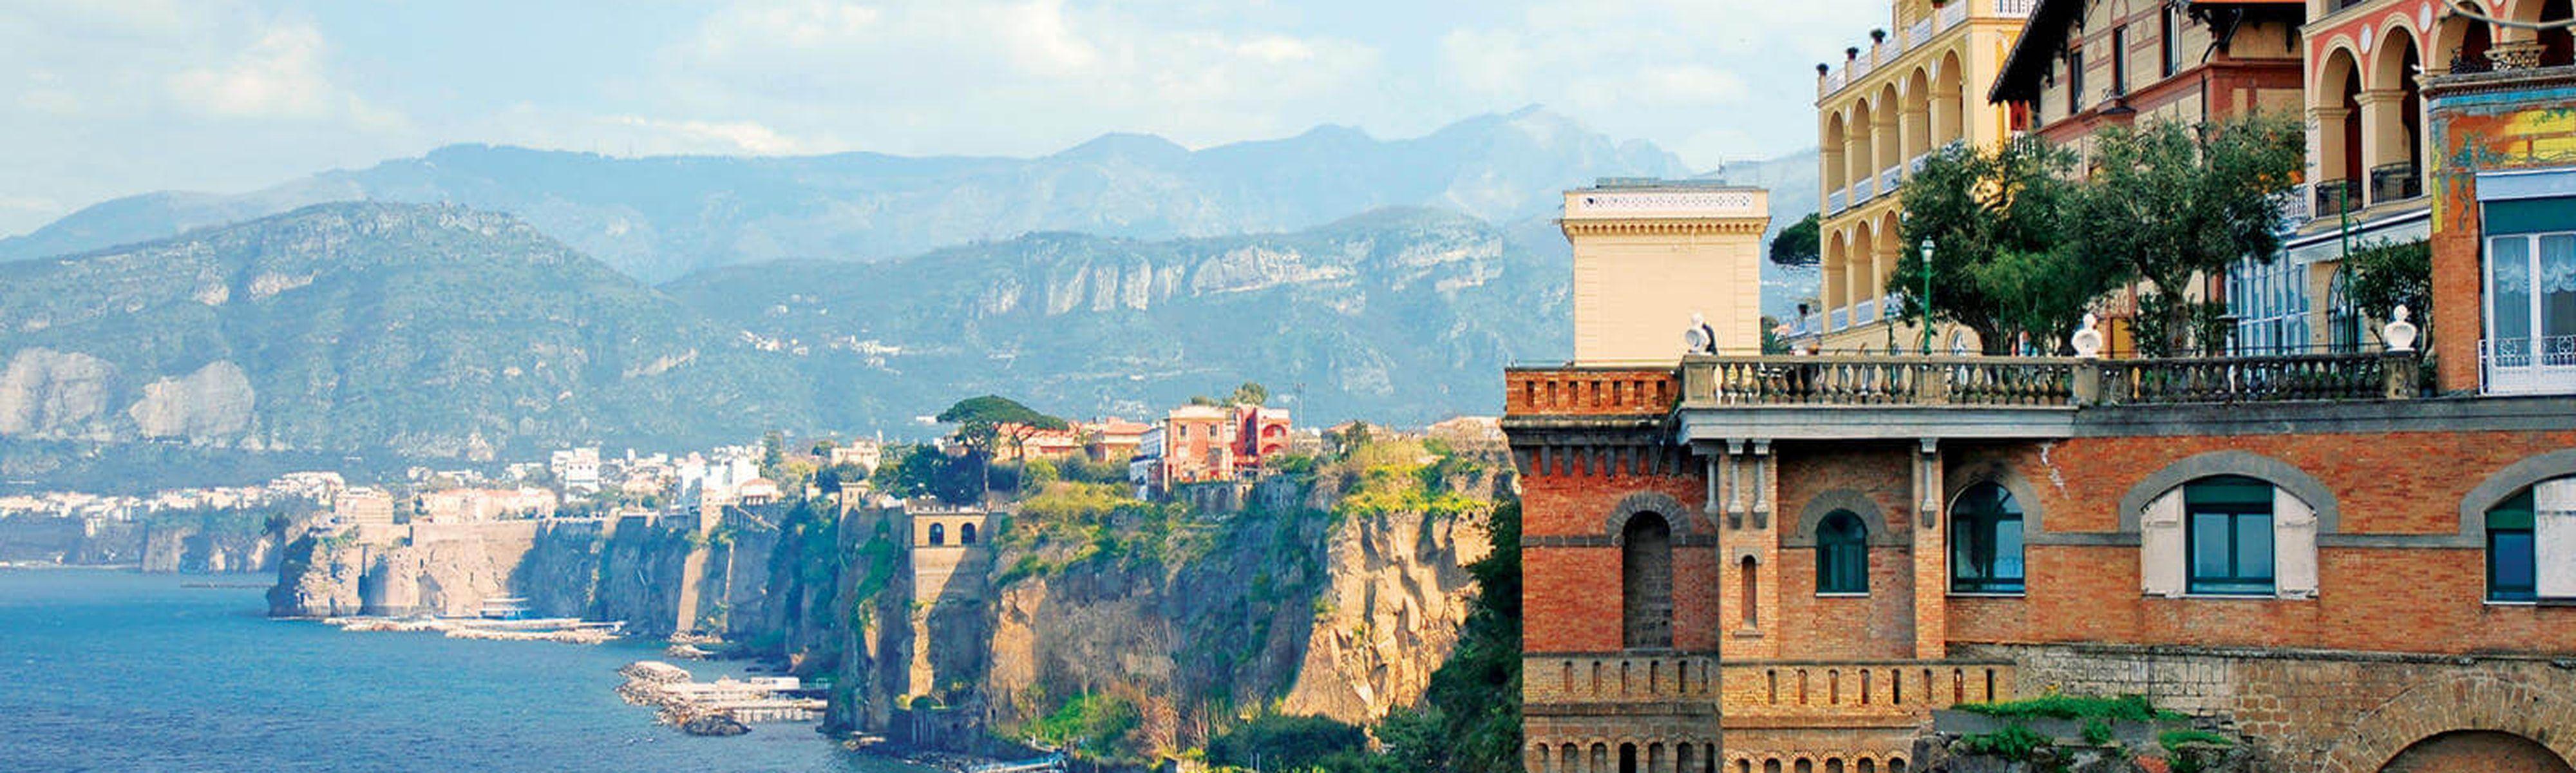 Italy Greece Ef Go Ahead Tours